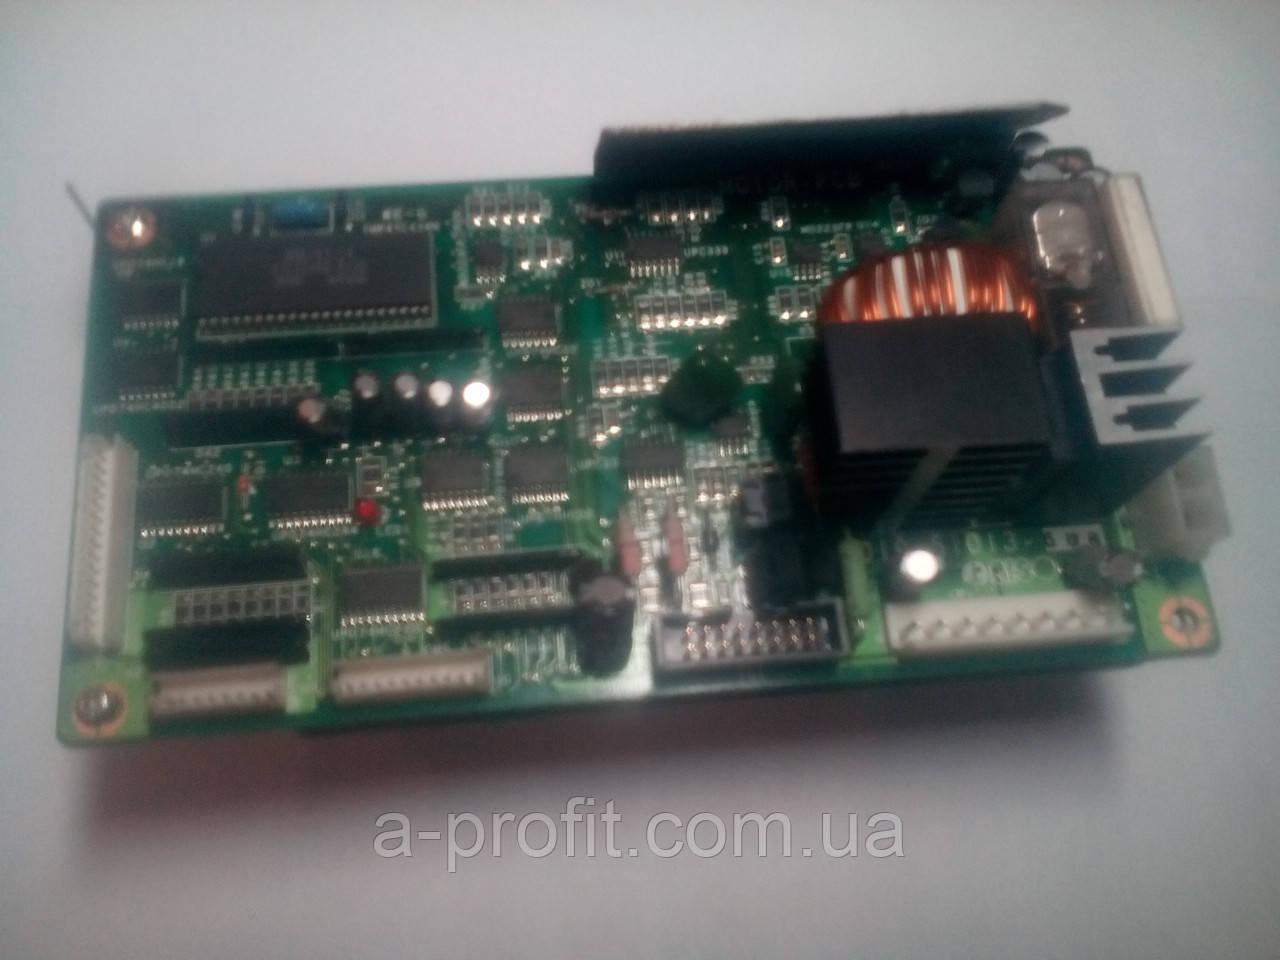 Motor control pcb ( пу приводоми